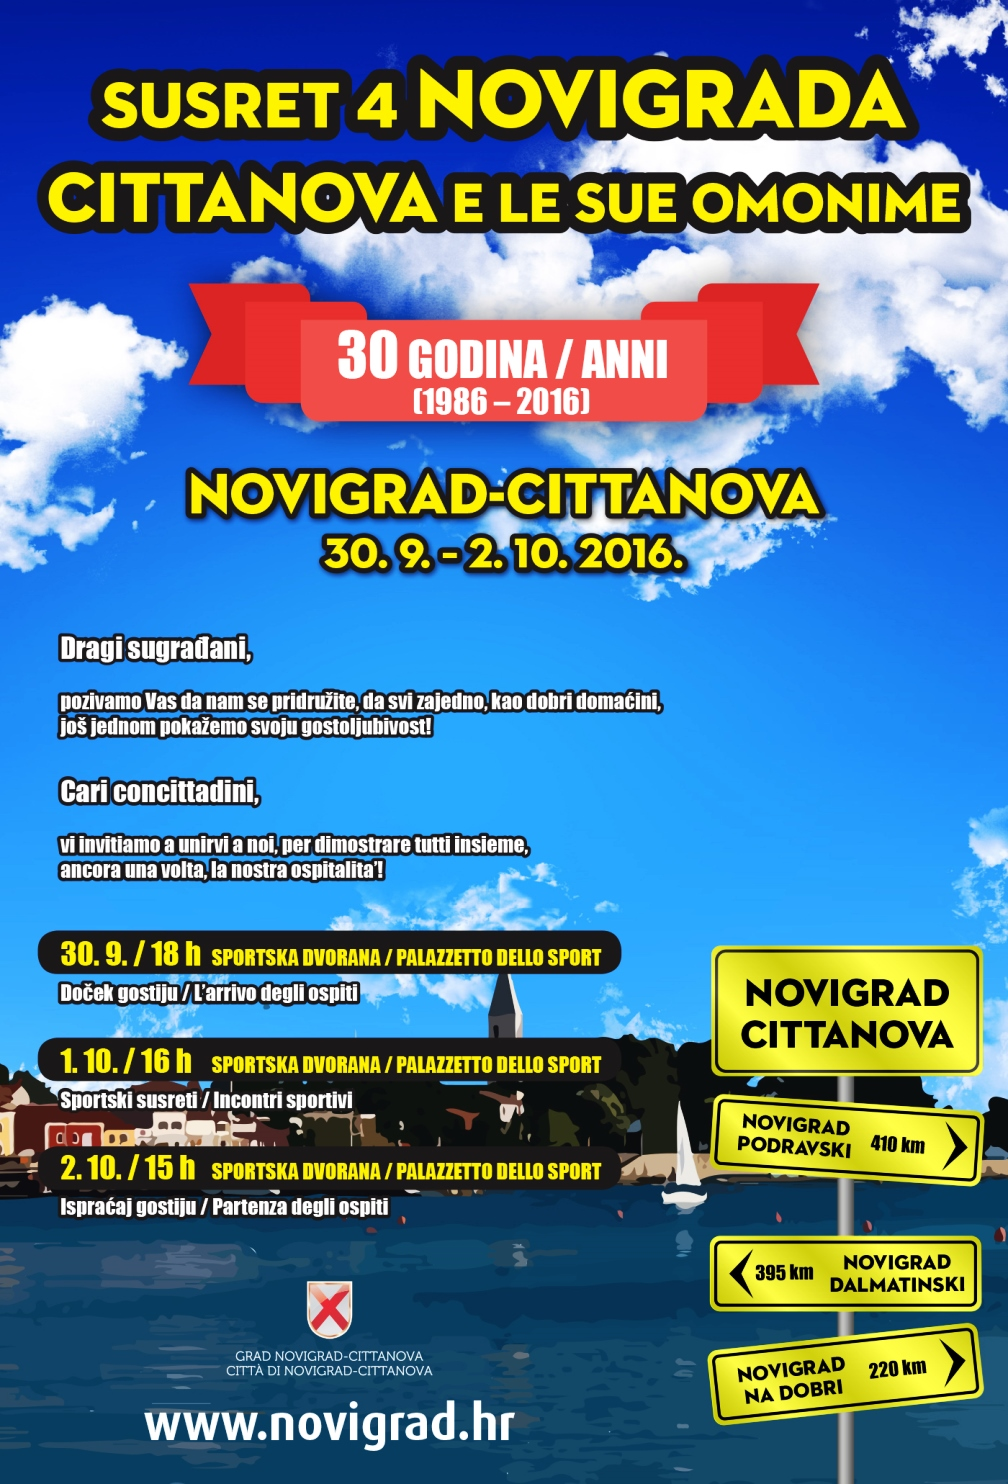 http://www.novigrad.hr/susret_novigrada